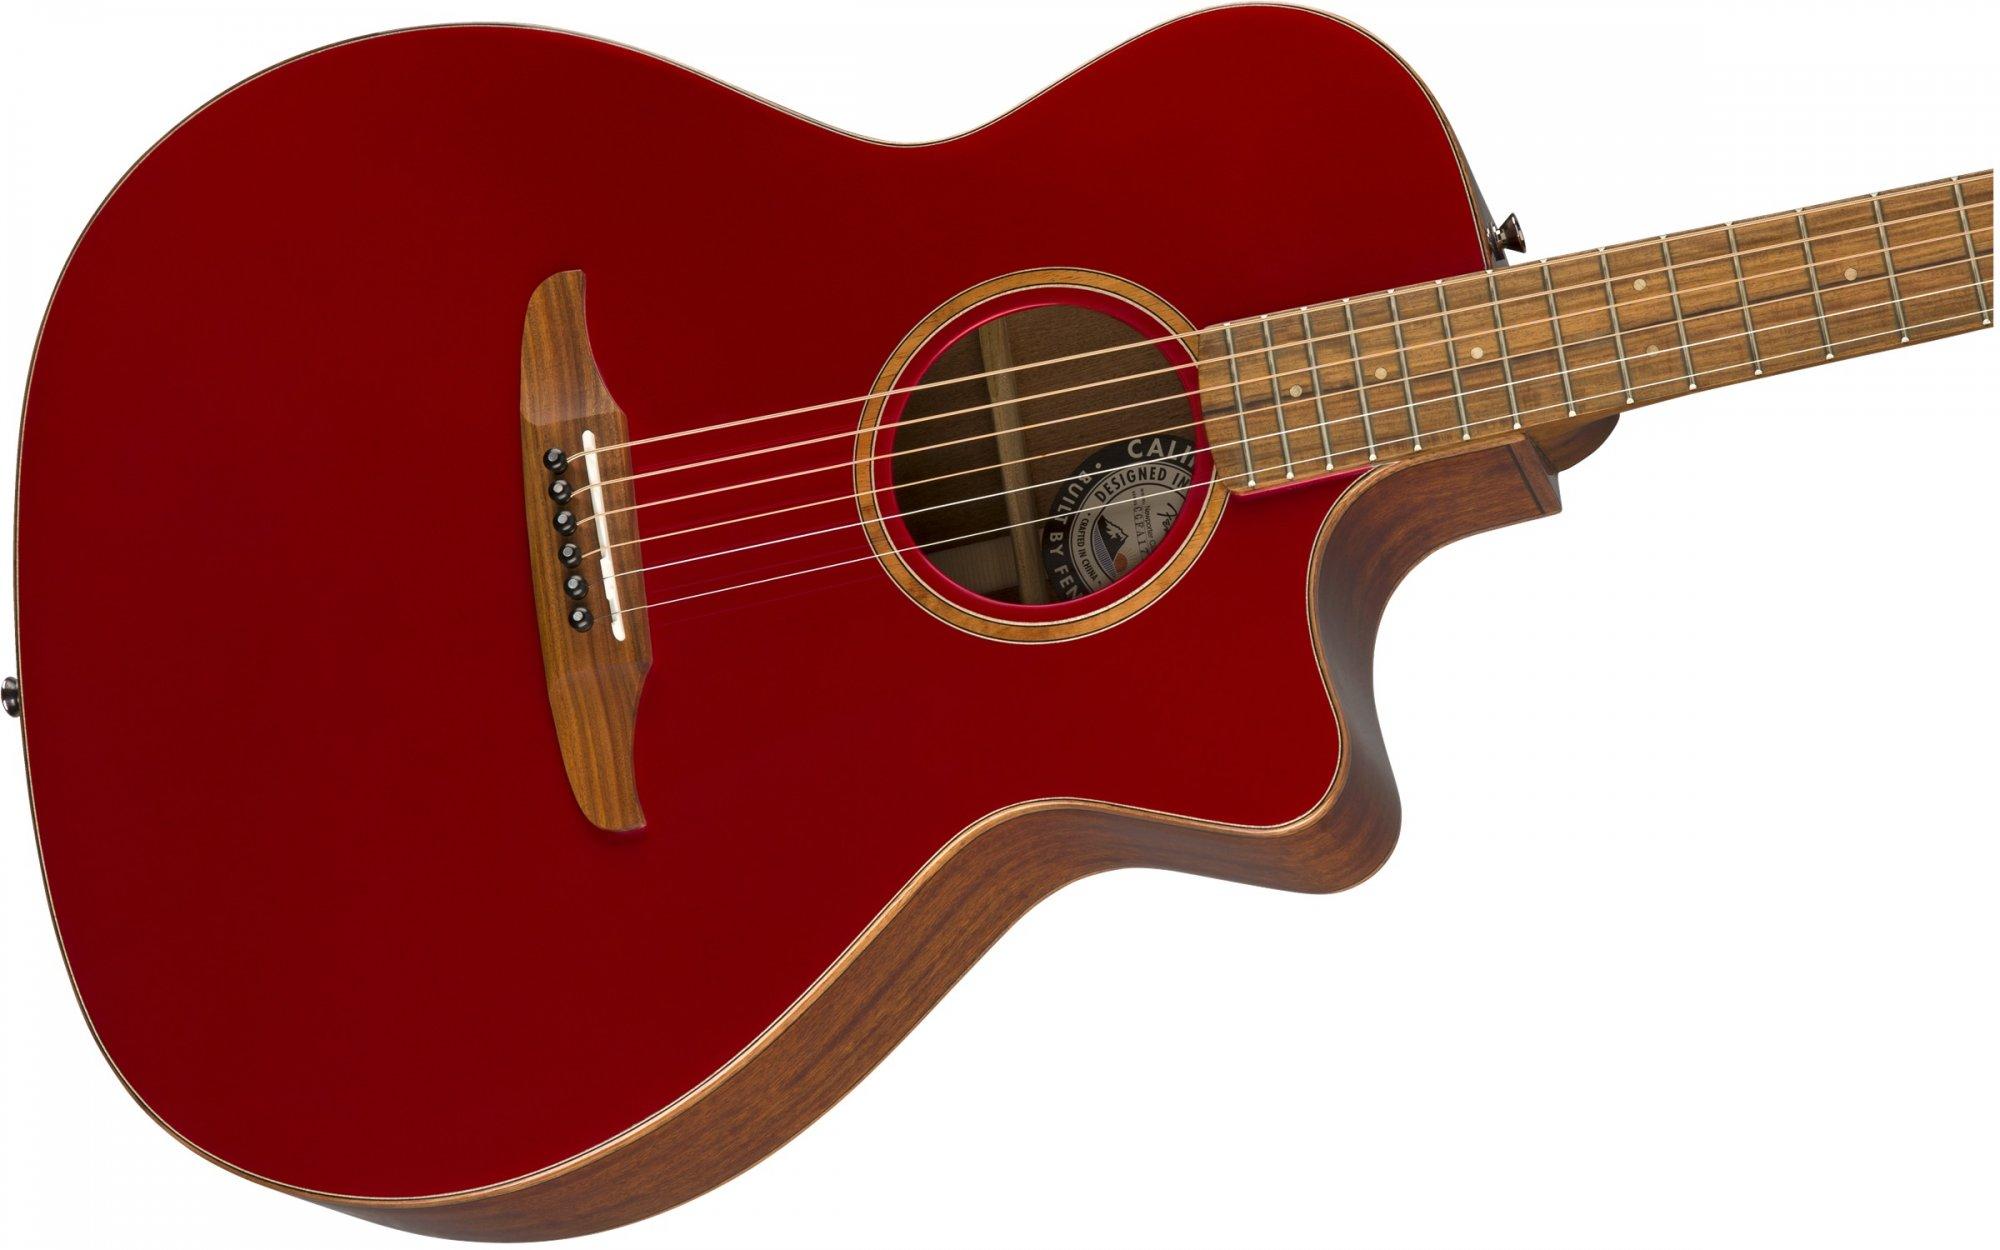 fender california series newporter classic acoustic electric guitar hot rod red metallic w bag. Black Bedroom Furniture Sets. Home Design Ideas